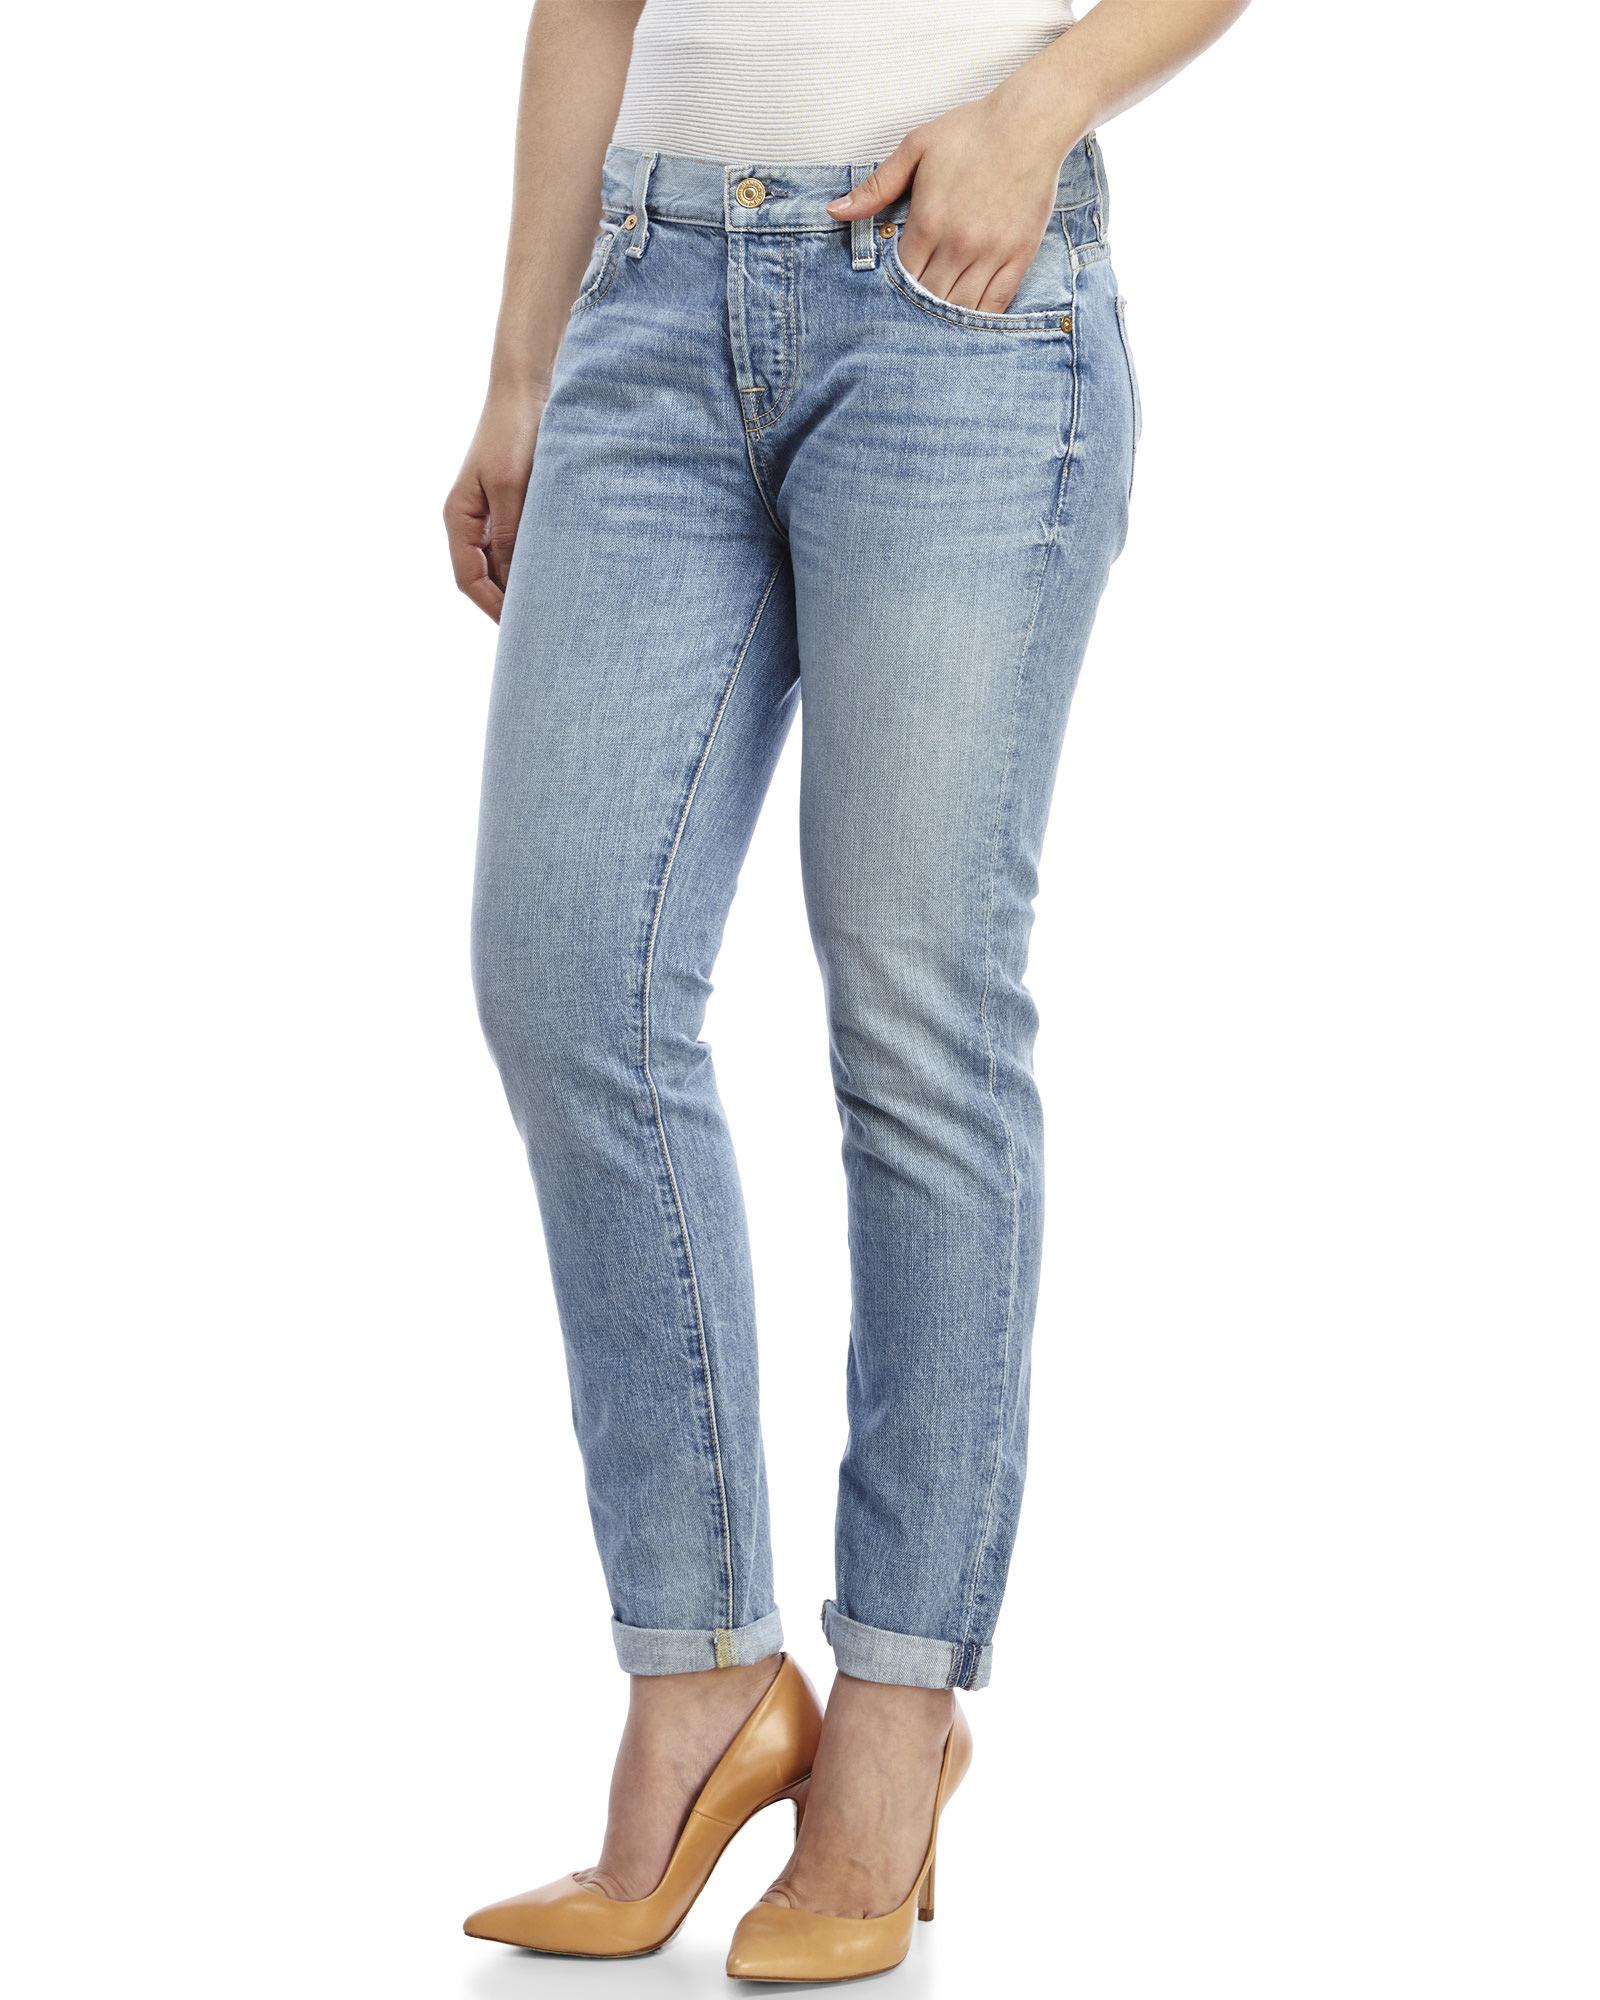 bee77cae648 7 For All Mankind Aura Blue Heritage Josefina Skinny Boyfriend Jeans ...